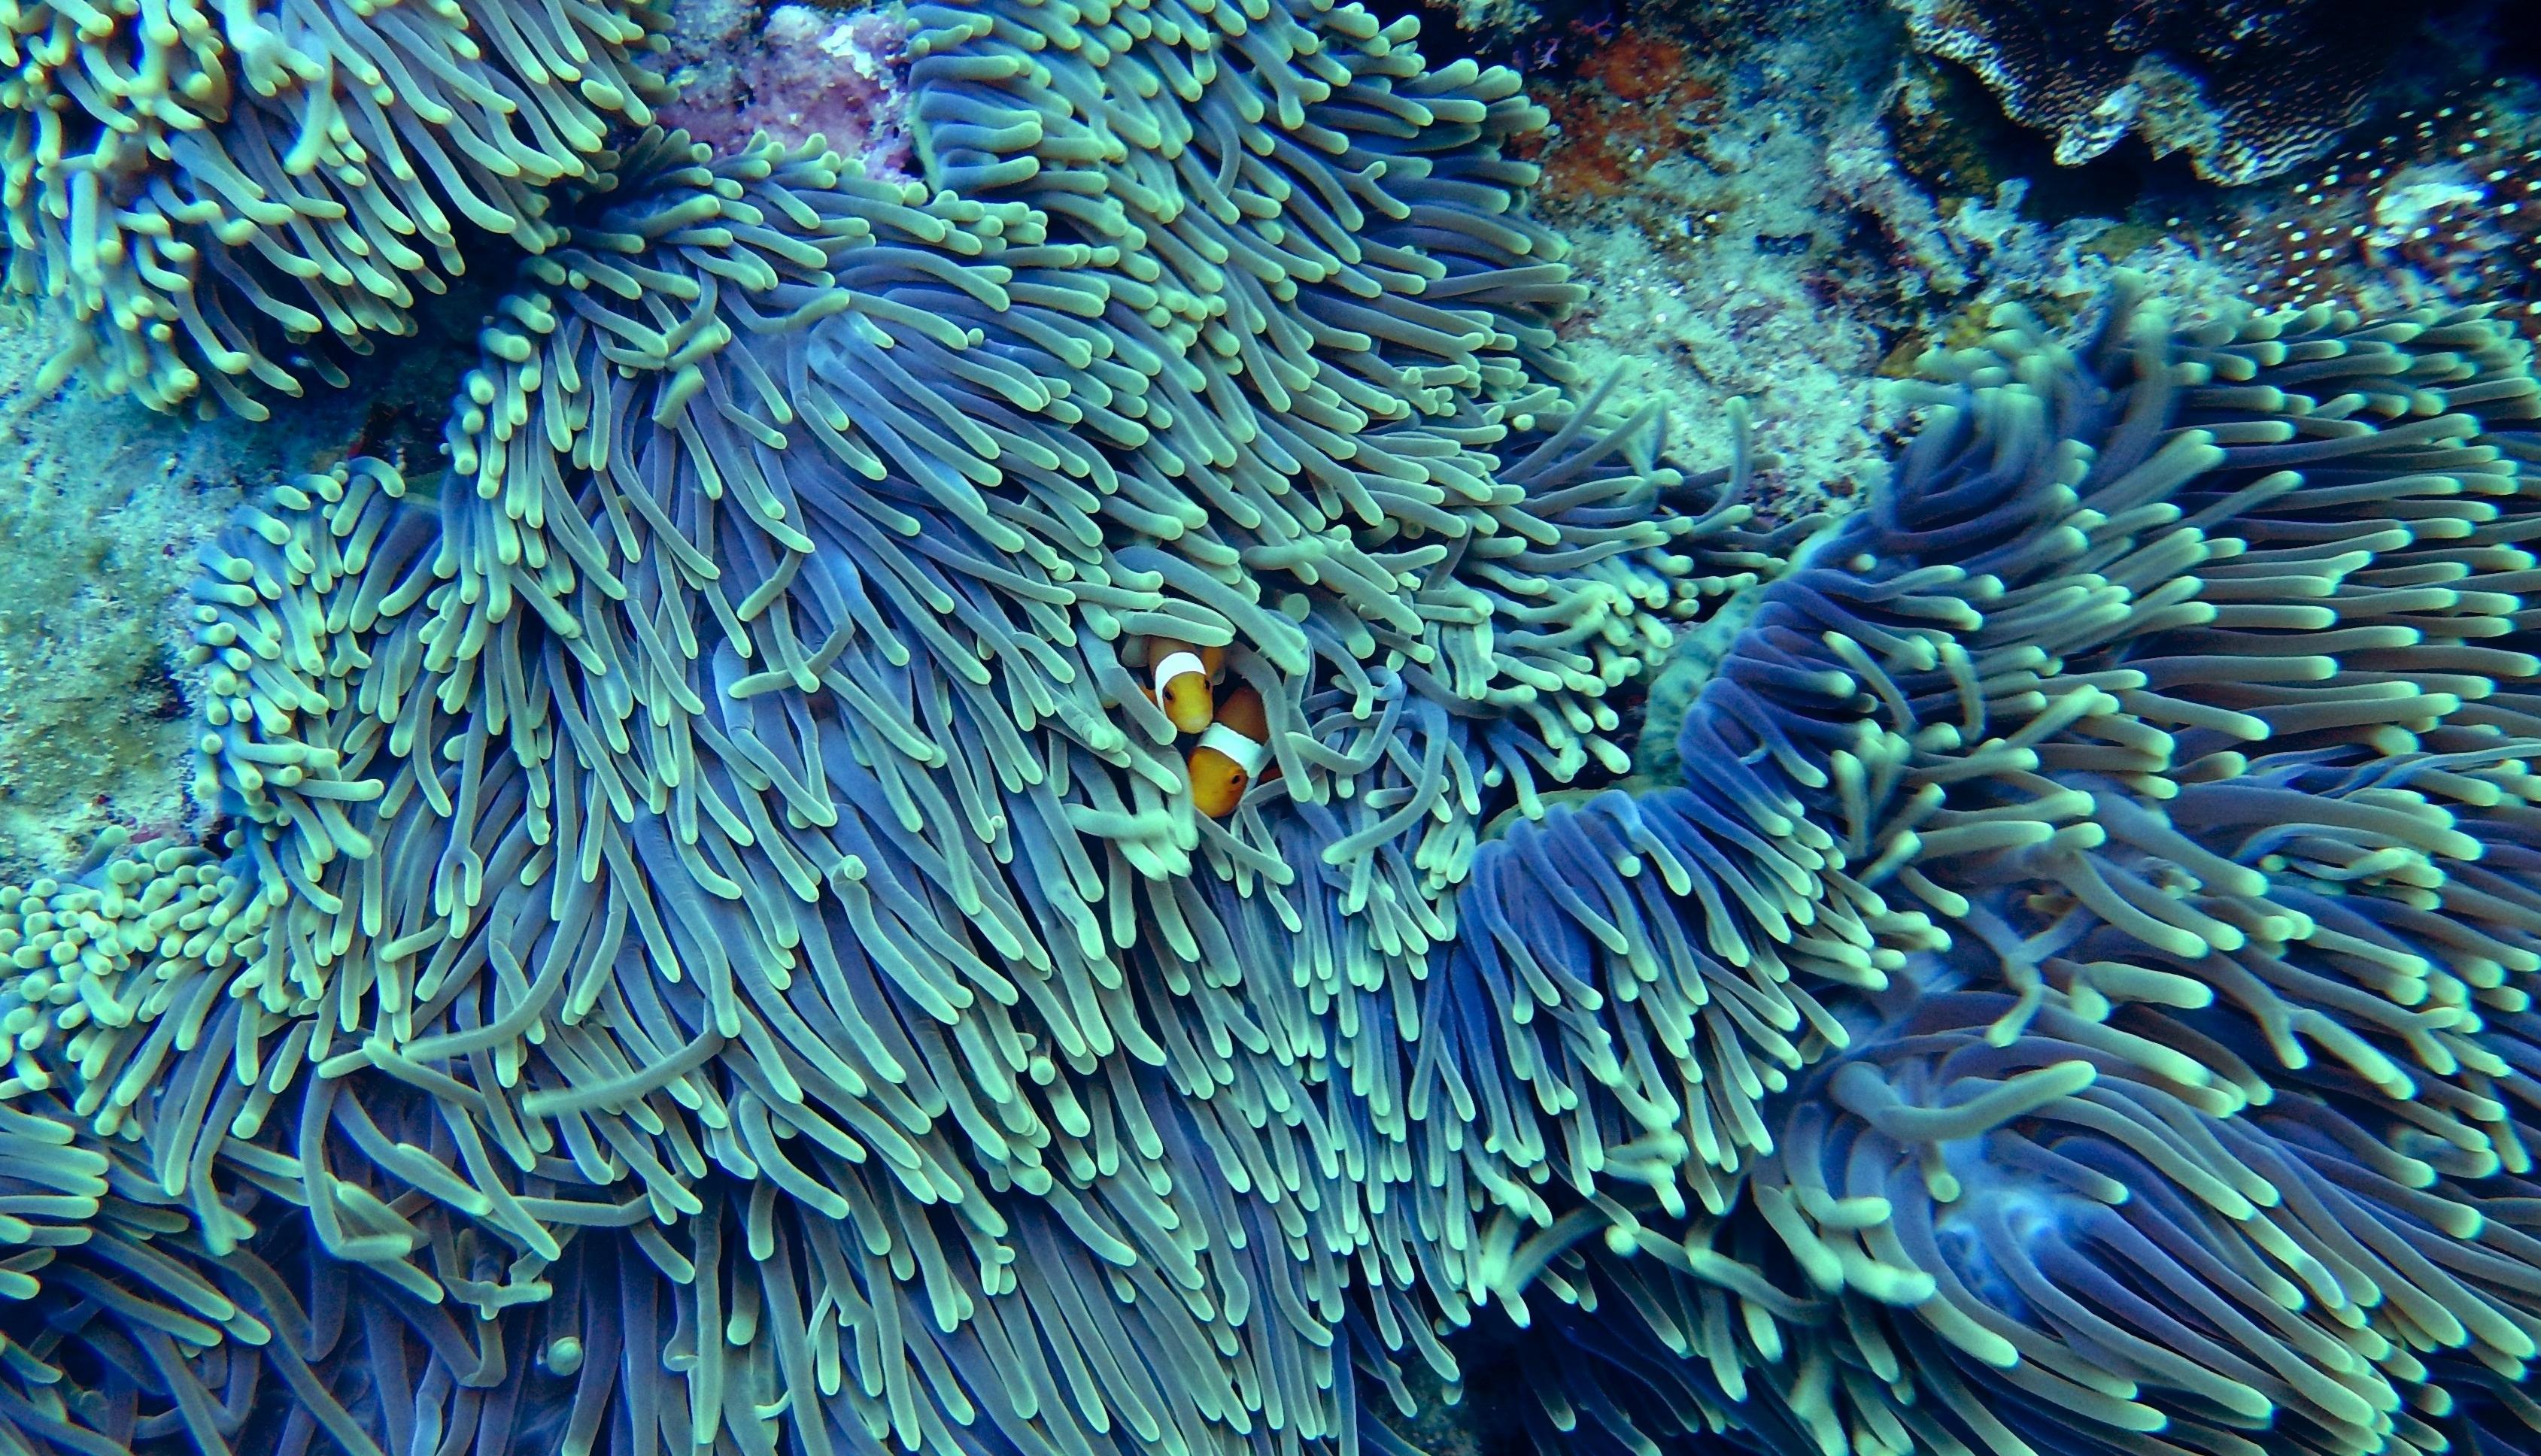 free images underwater coral reef invertebrate clown. Black Bedroom Furniture Sets. Home Design Ideas